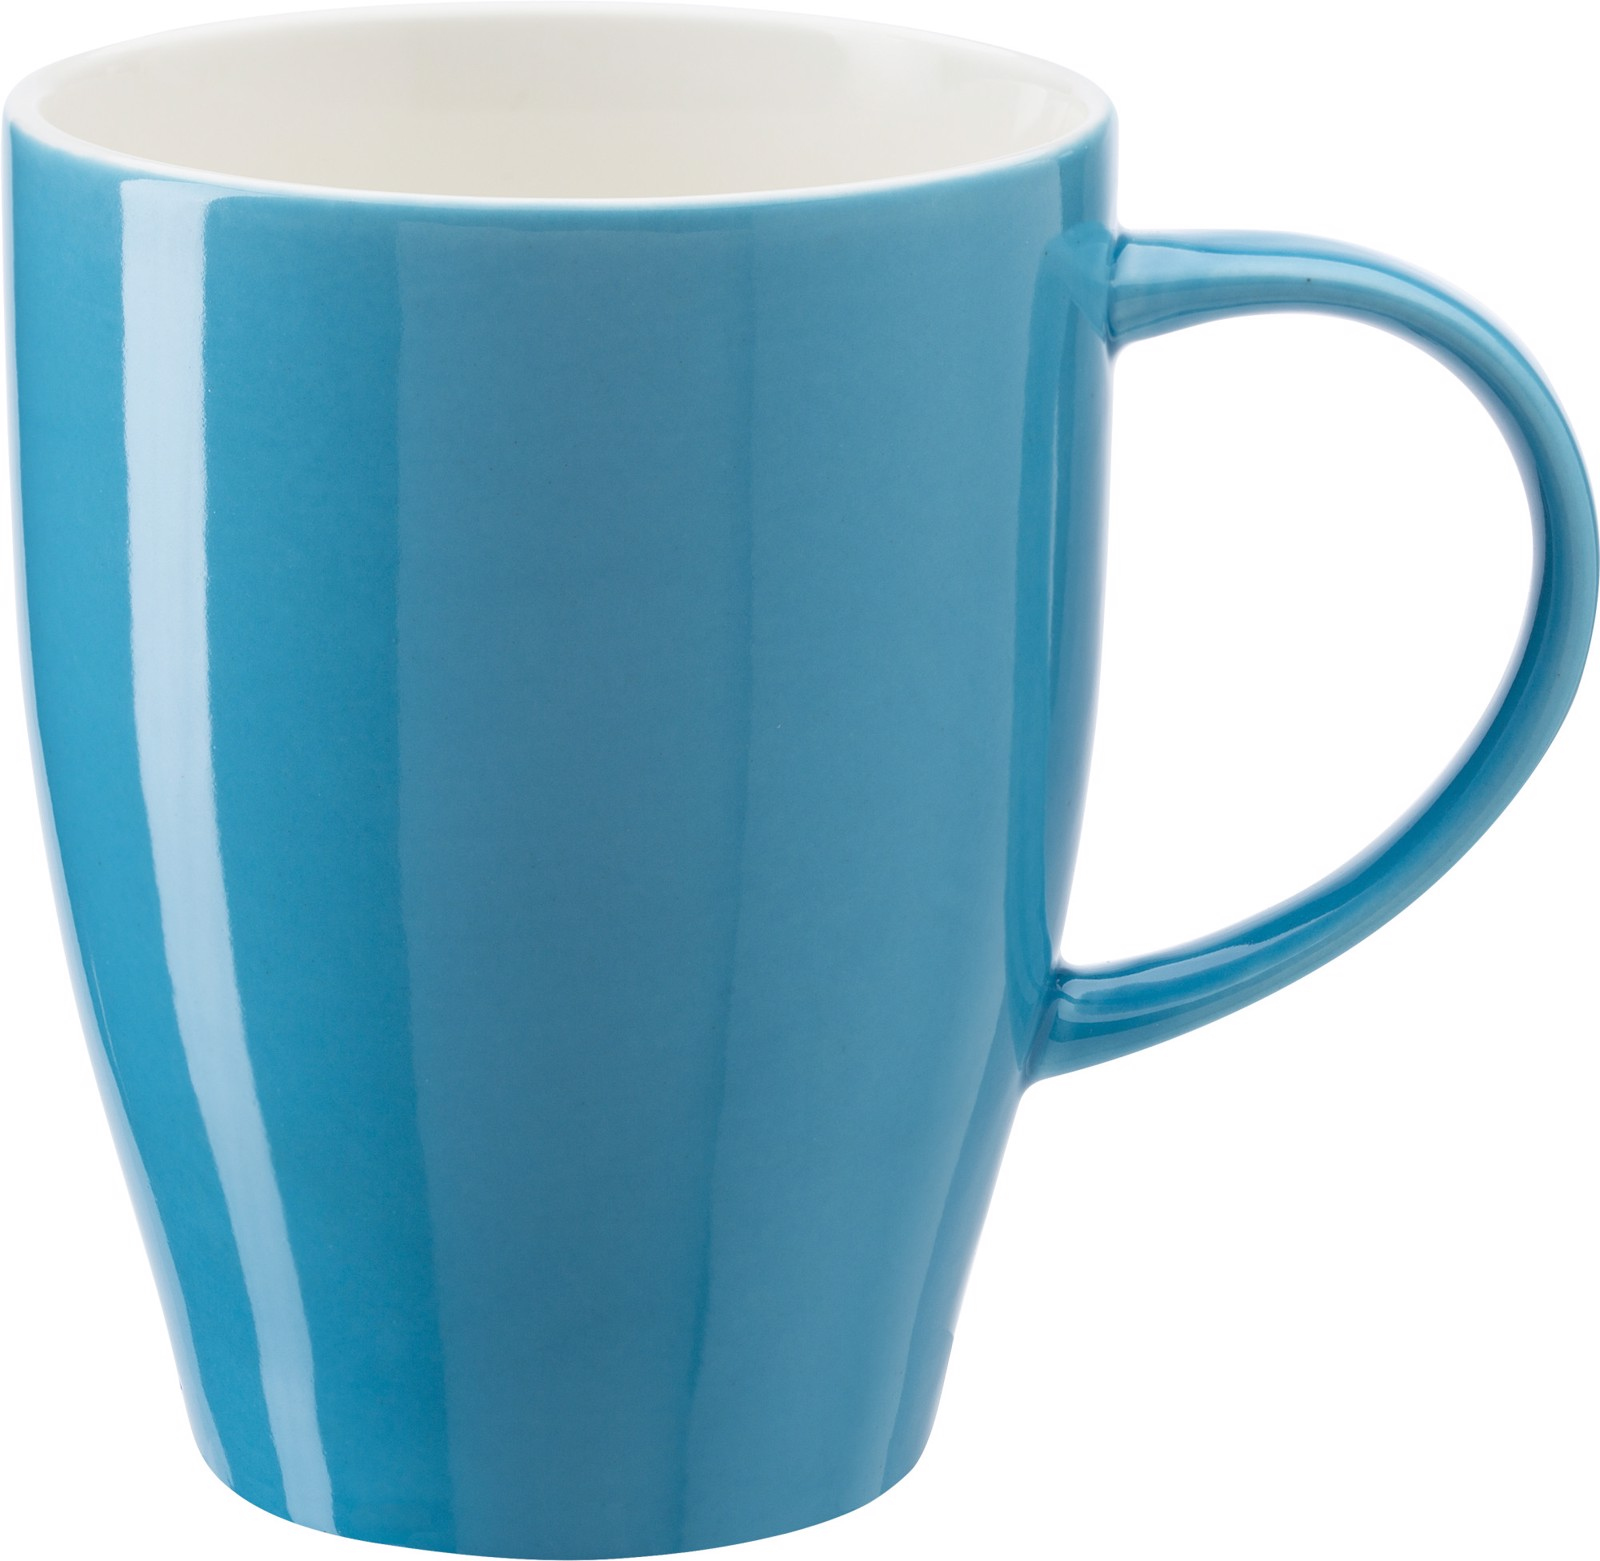 Porcelain mug - Light Blue